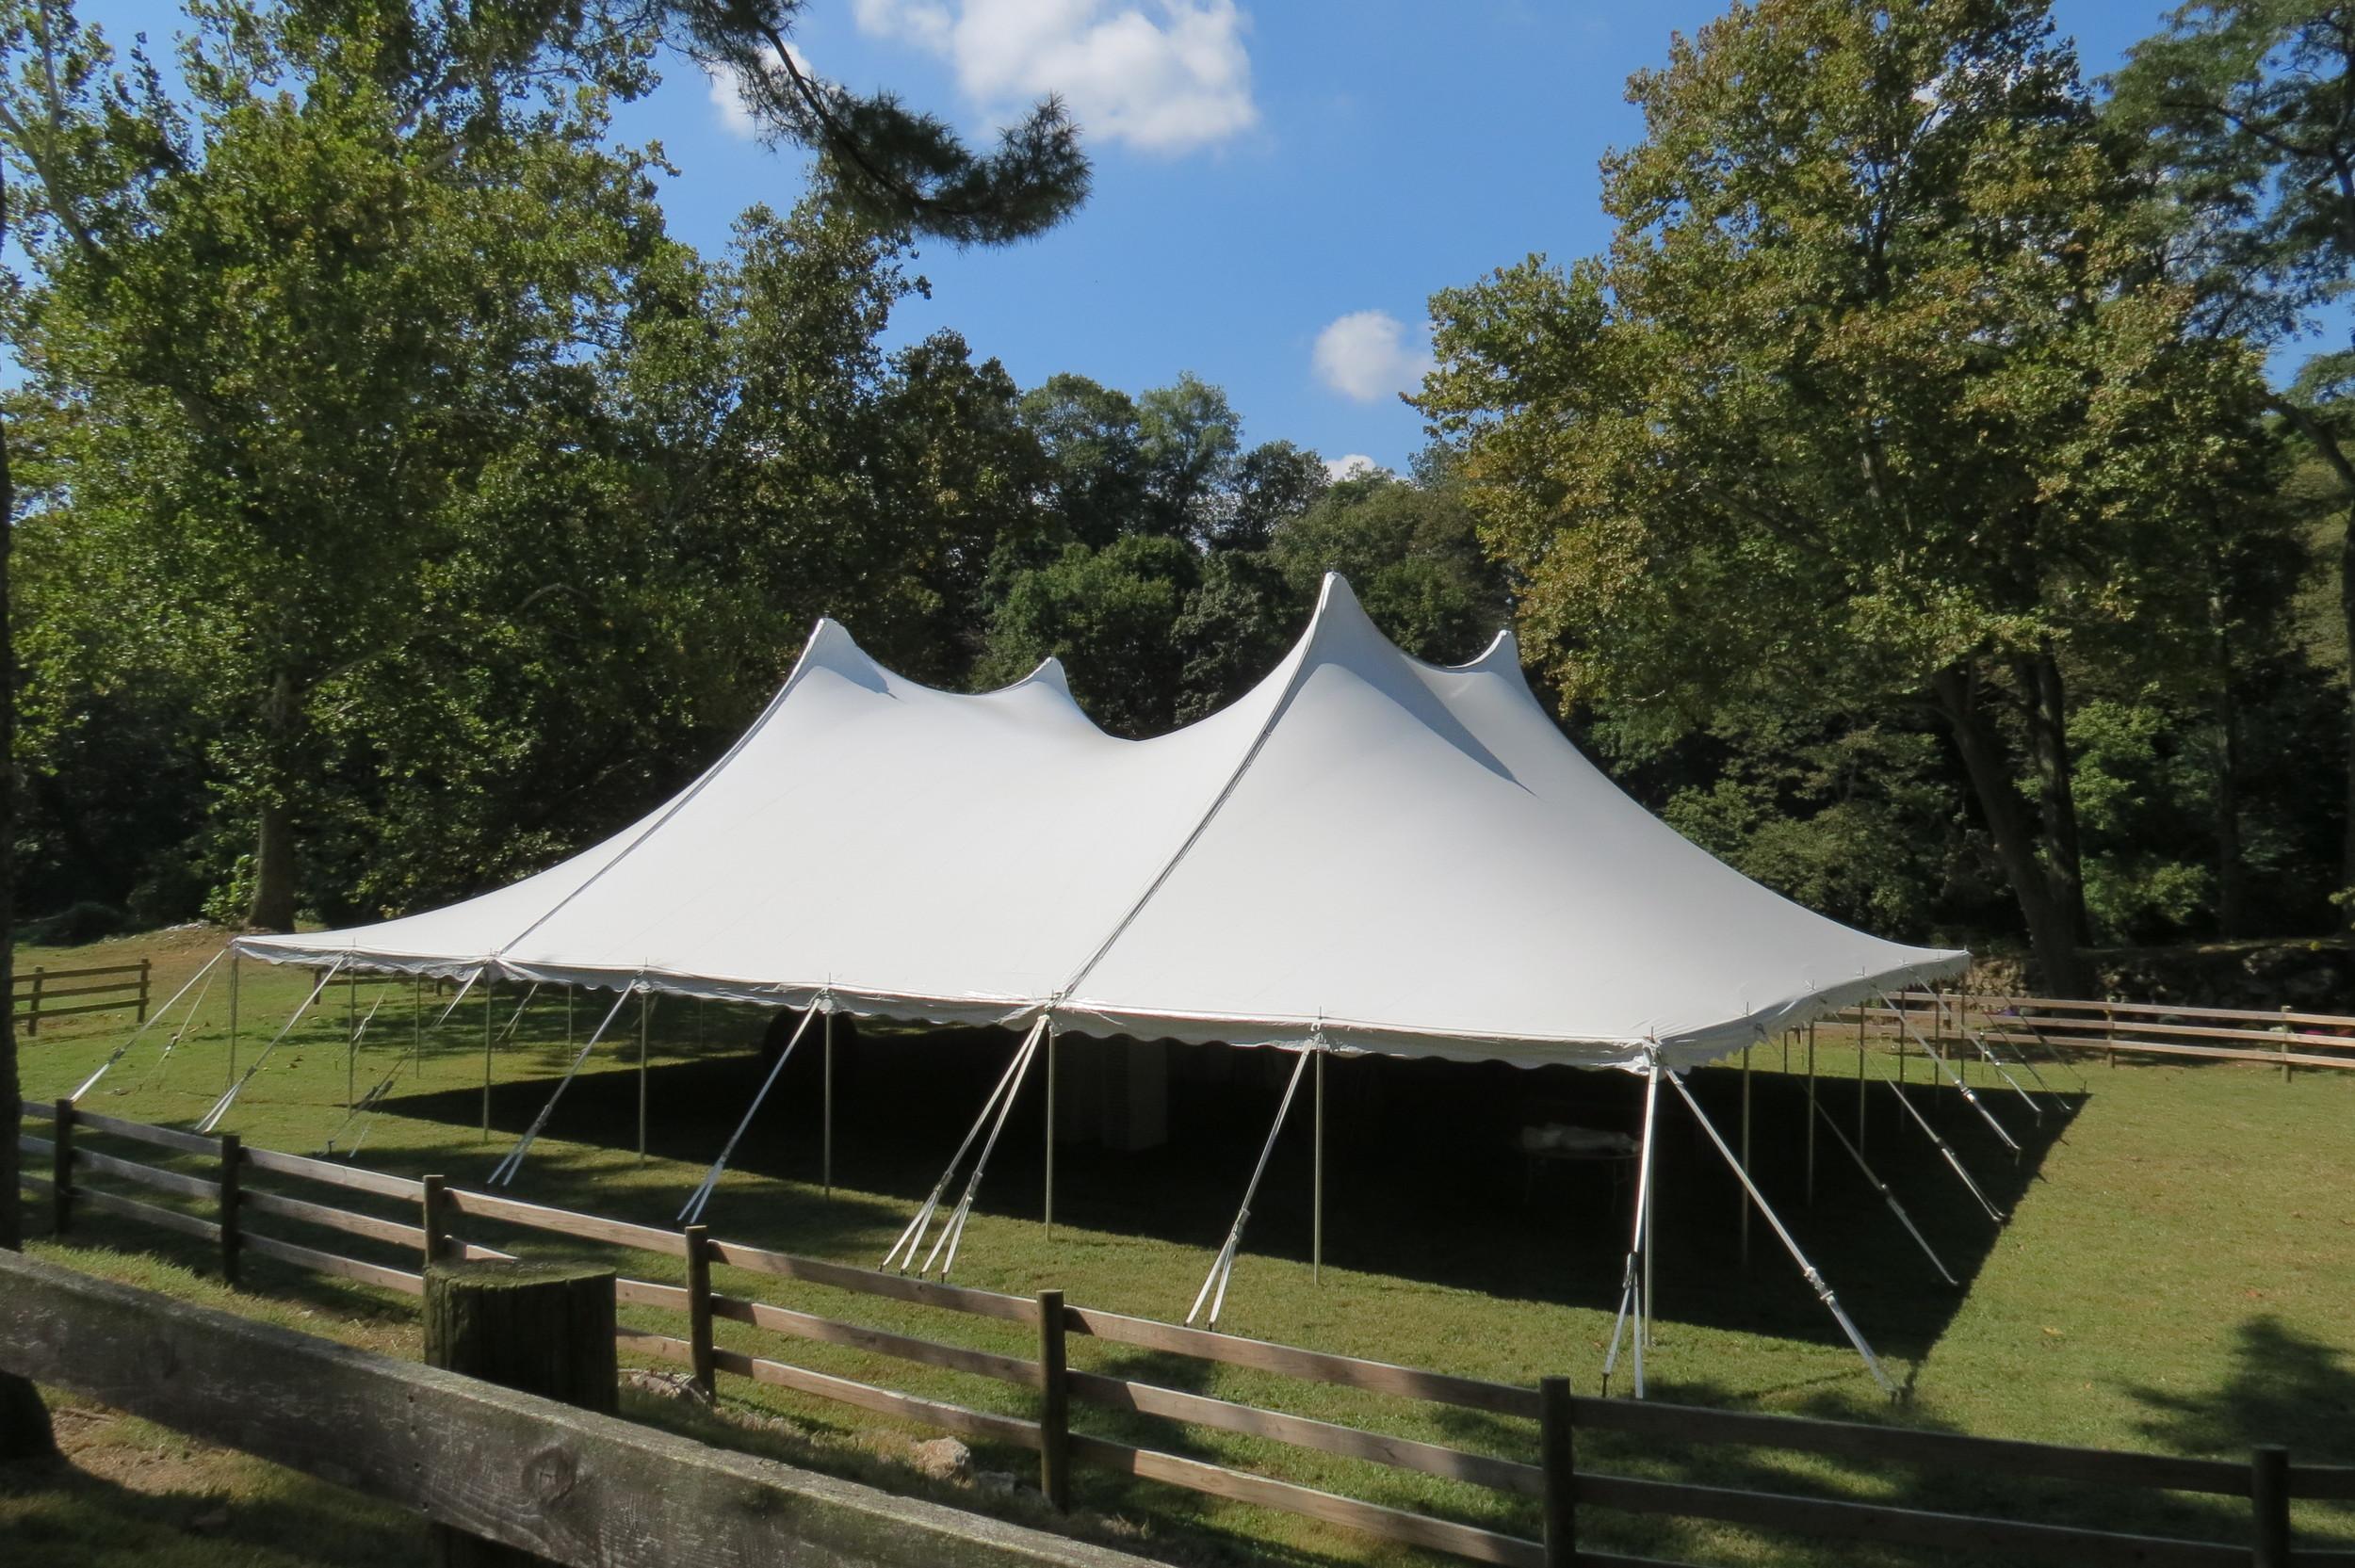 60x70 white tent